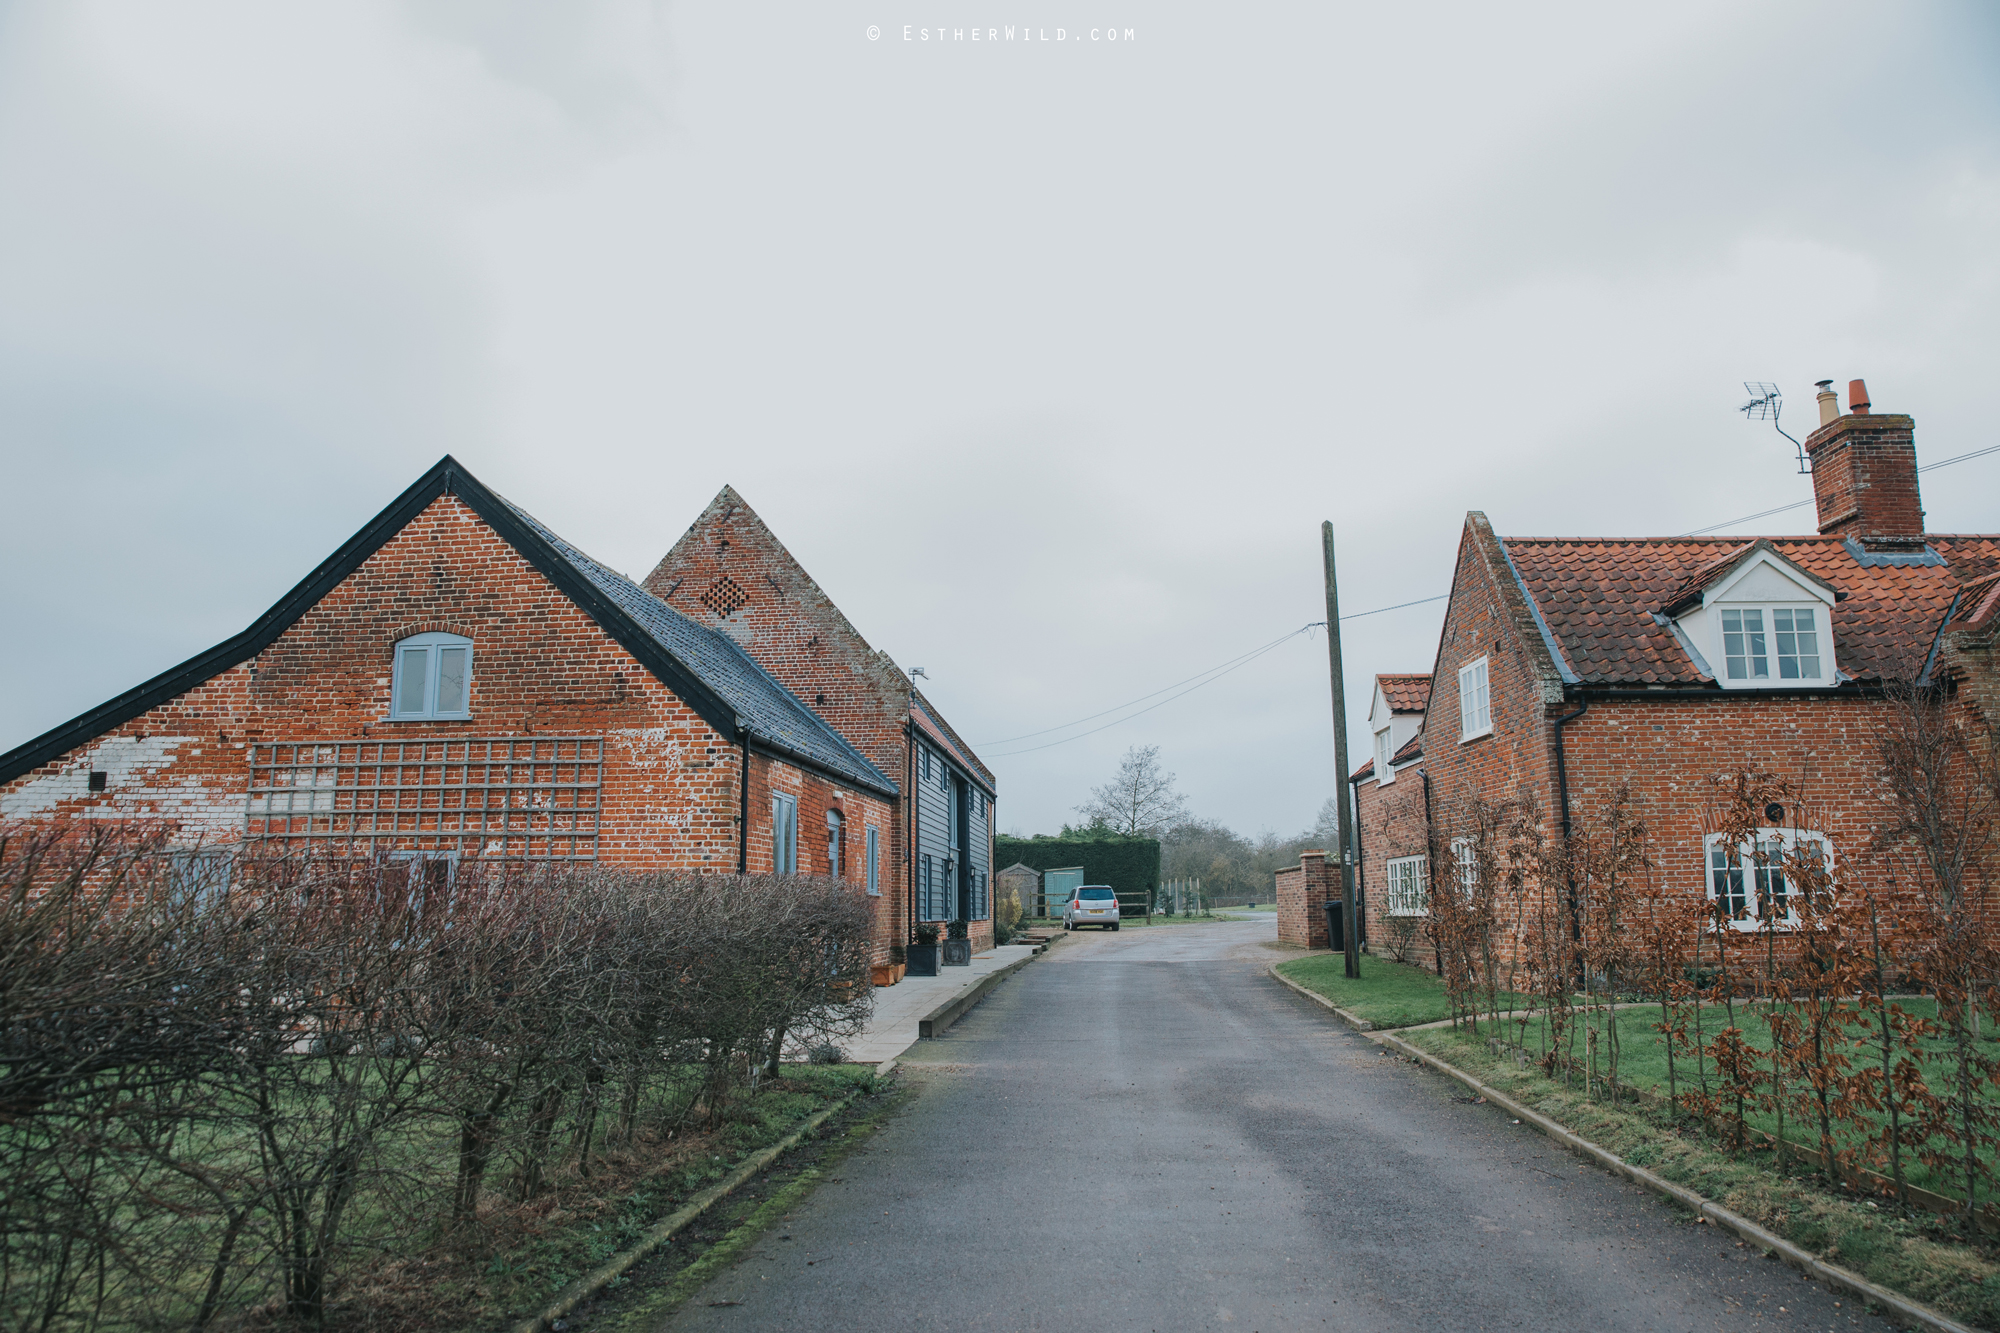 Elms_Barn_Weddings_Suffolk_Photographer_Copyright_Esther_Wild_IMG_0063.jpg